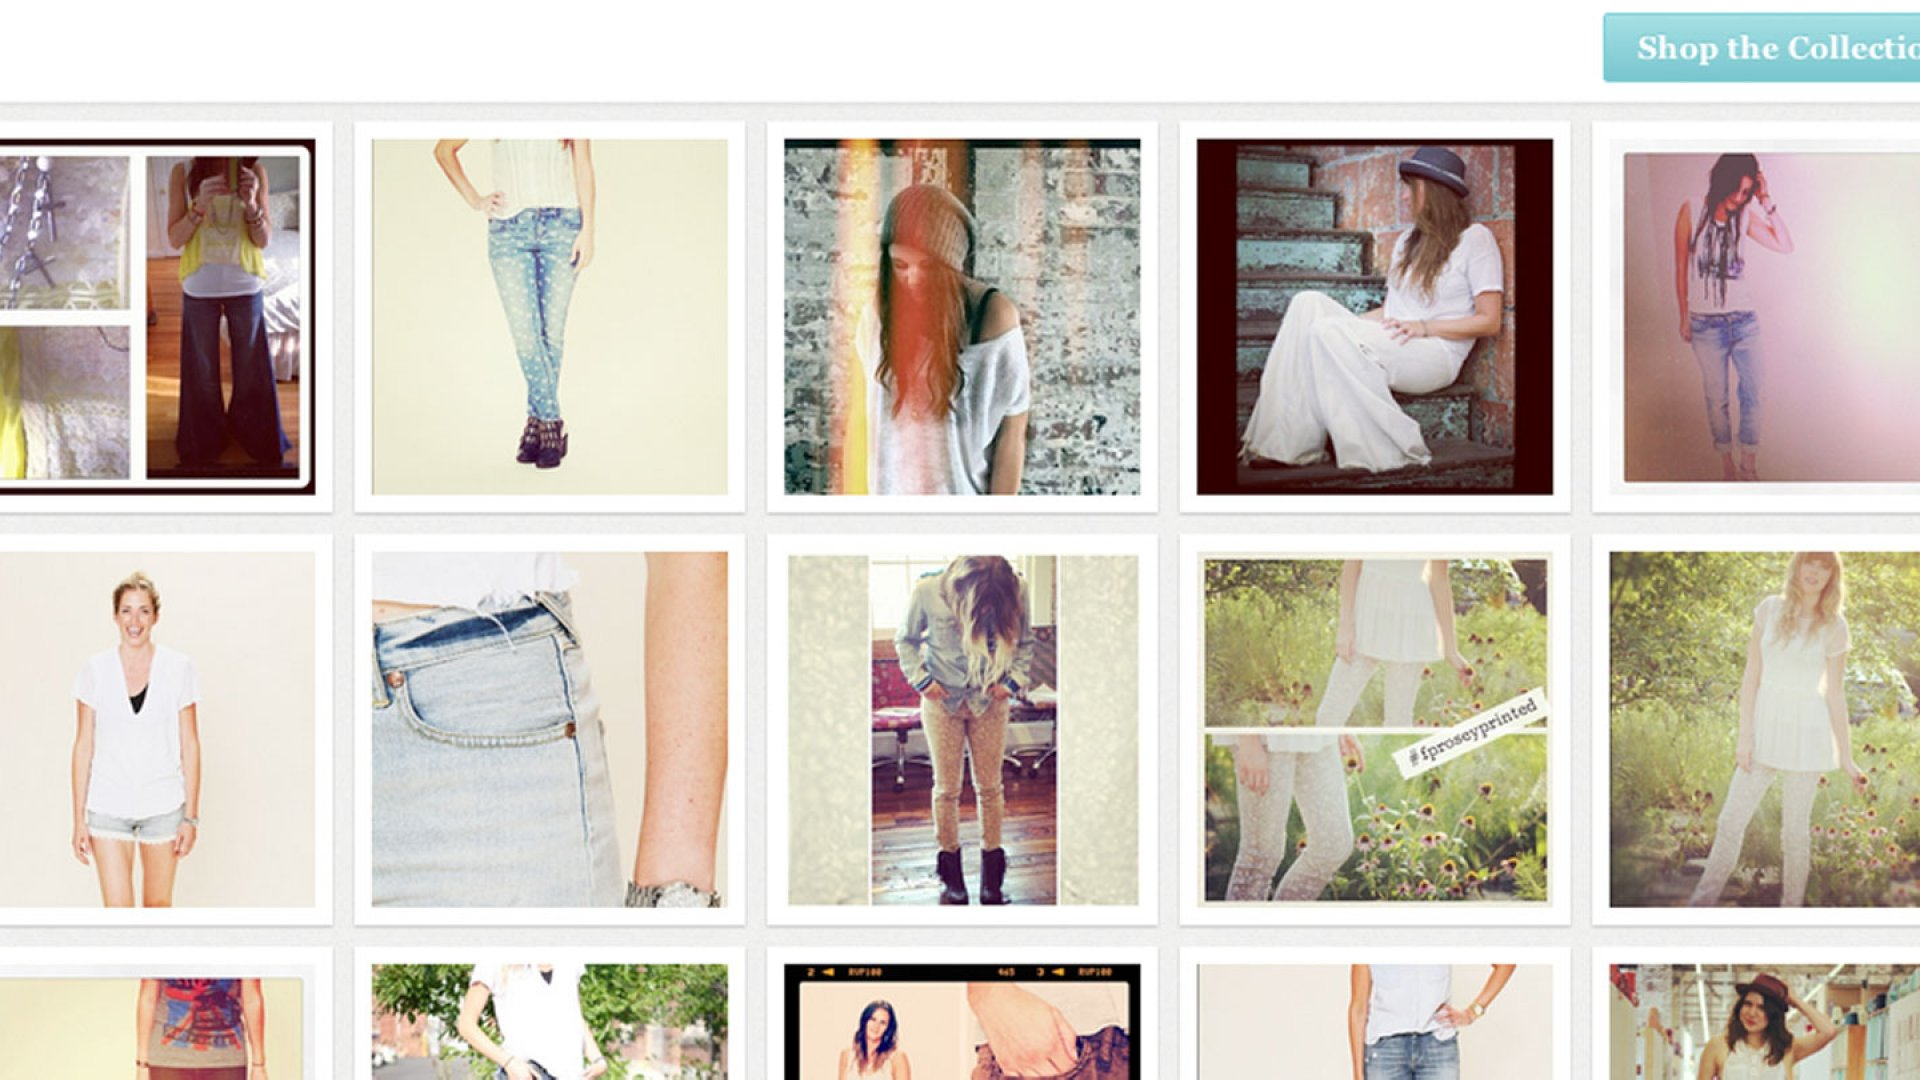 Instagram: Killer App for Retailers?